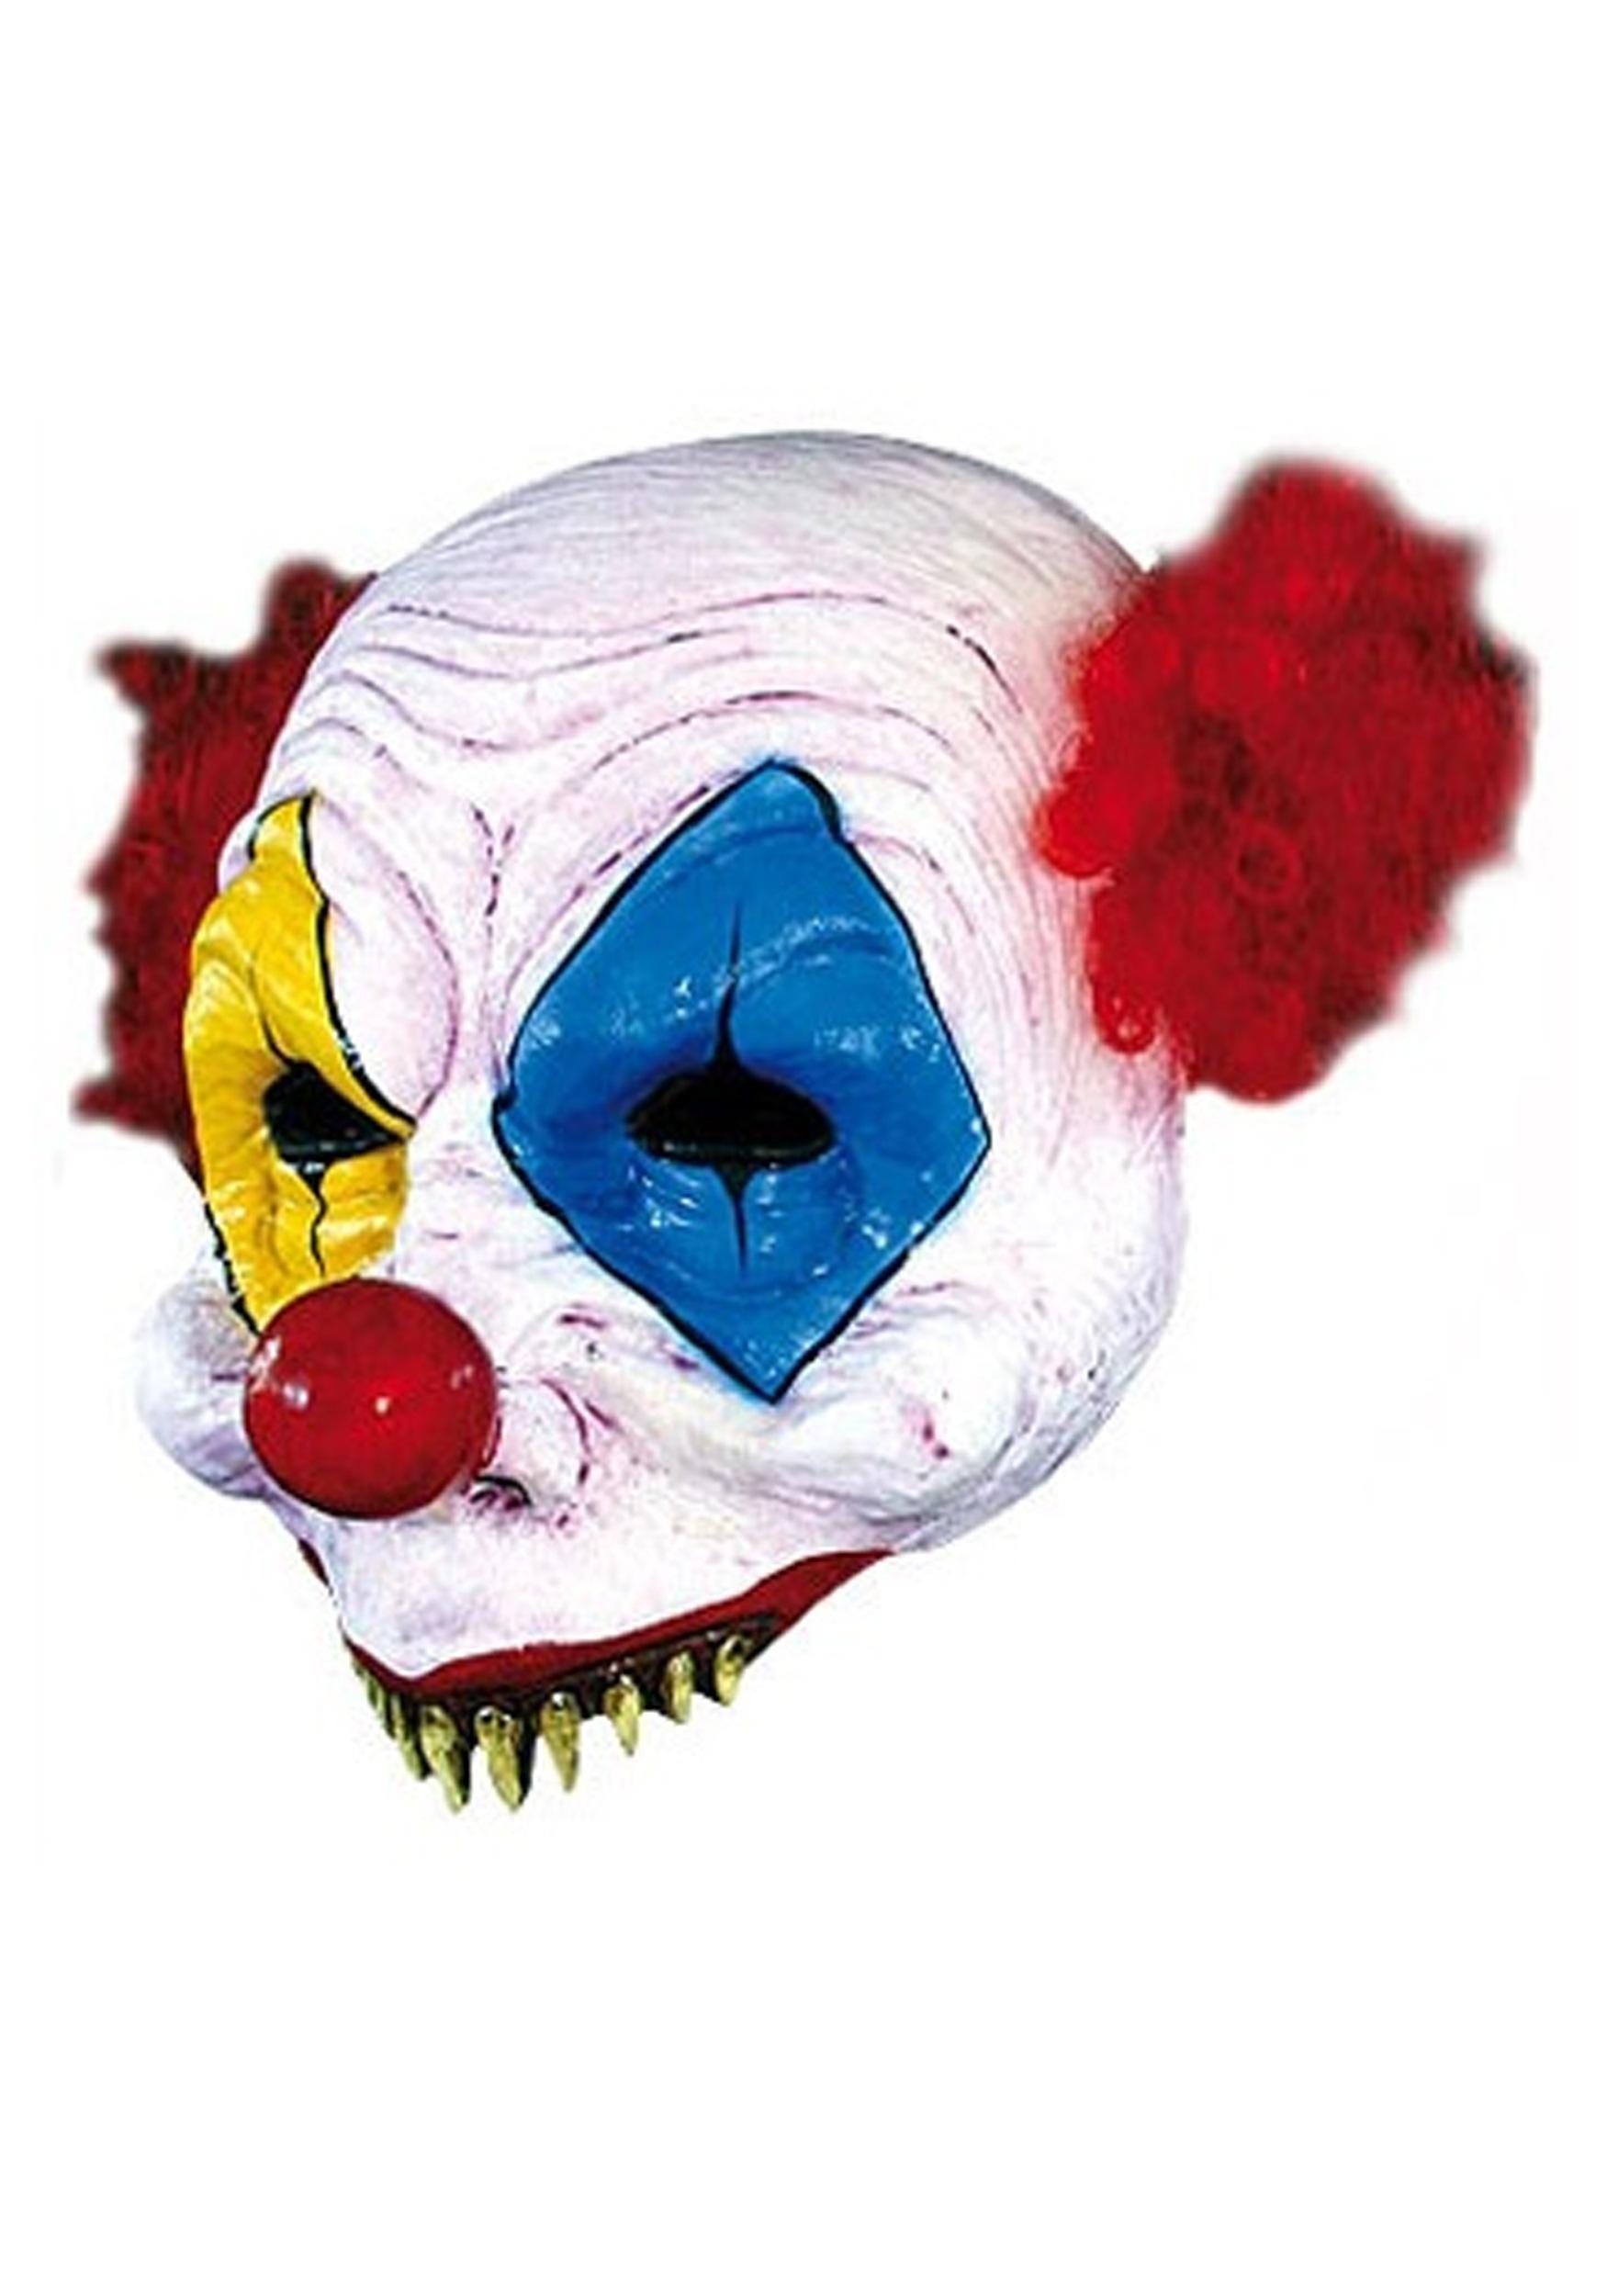 Scary Clown Half Mask Scary Halloween Clown Masks